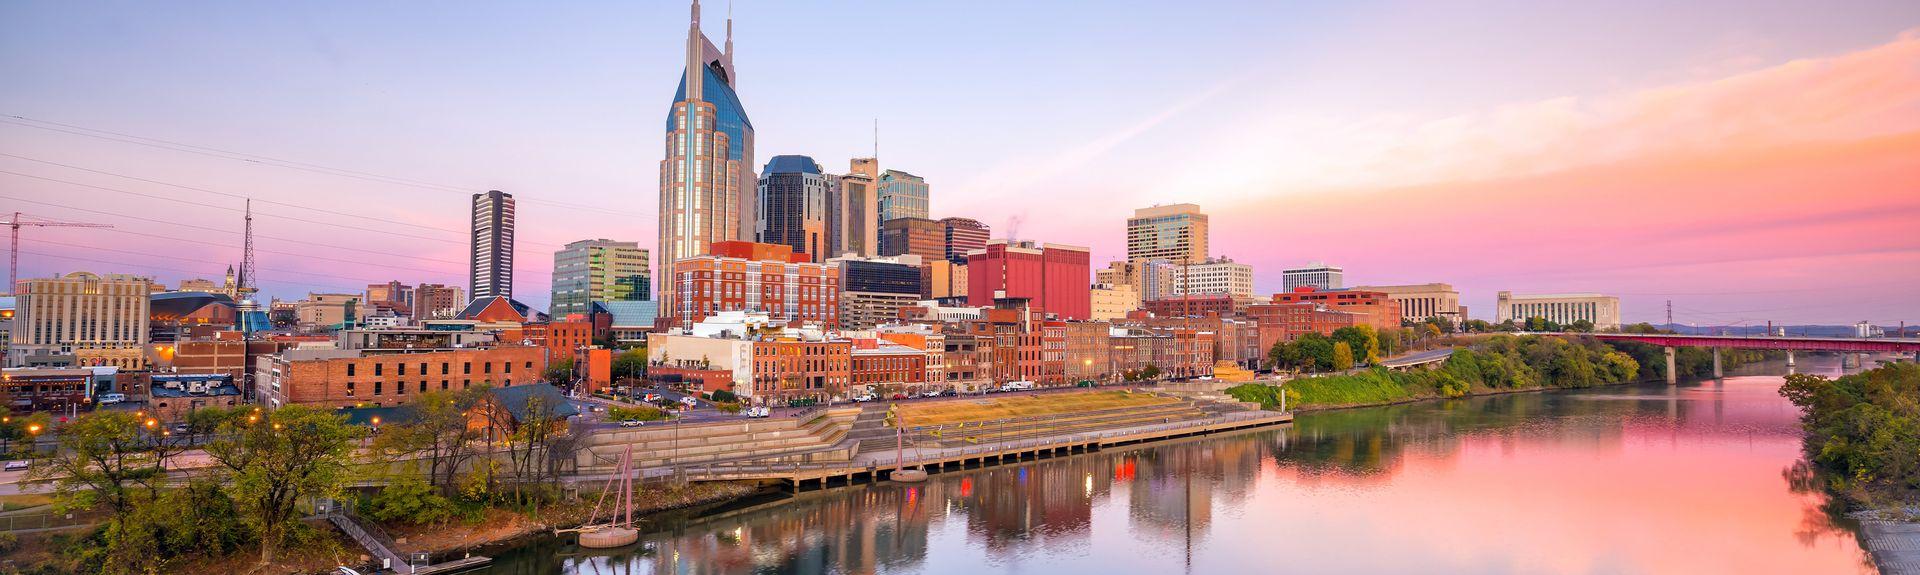 Binnenstad van Nashville, Nashville, Tennessee, Verenigde Staten